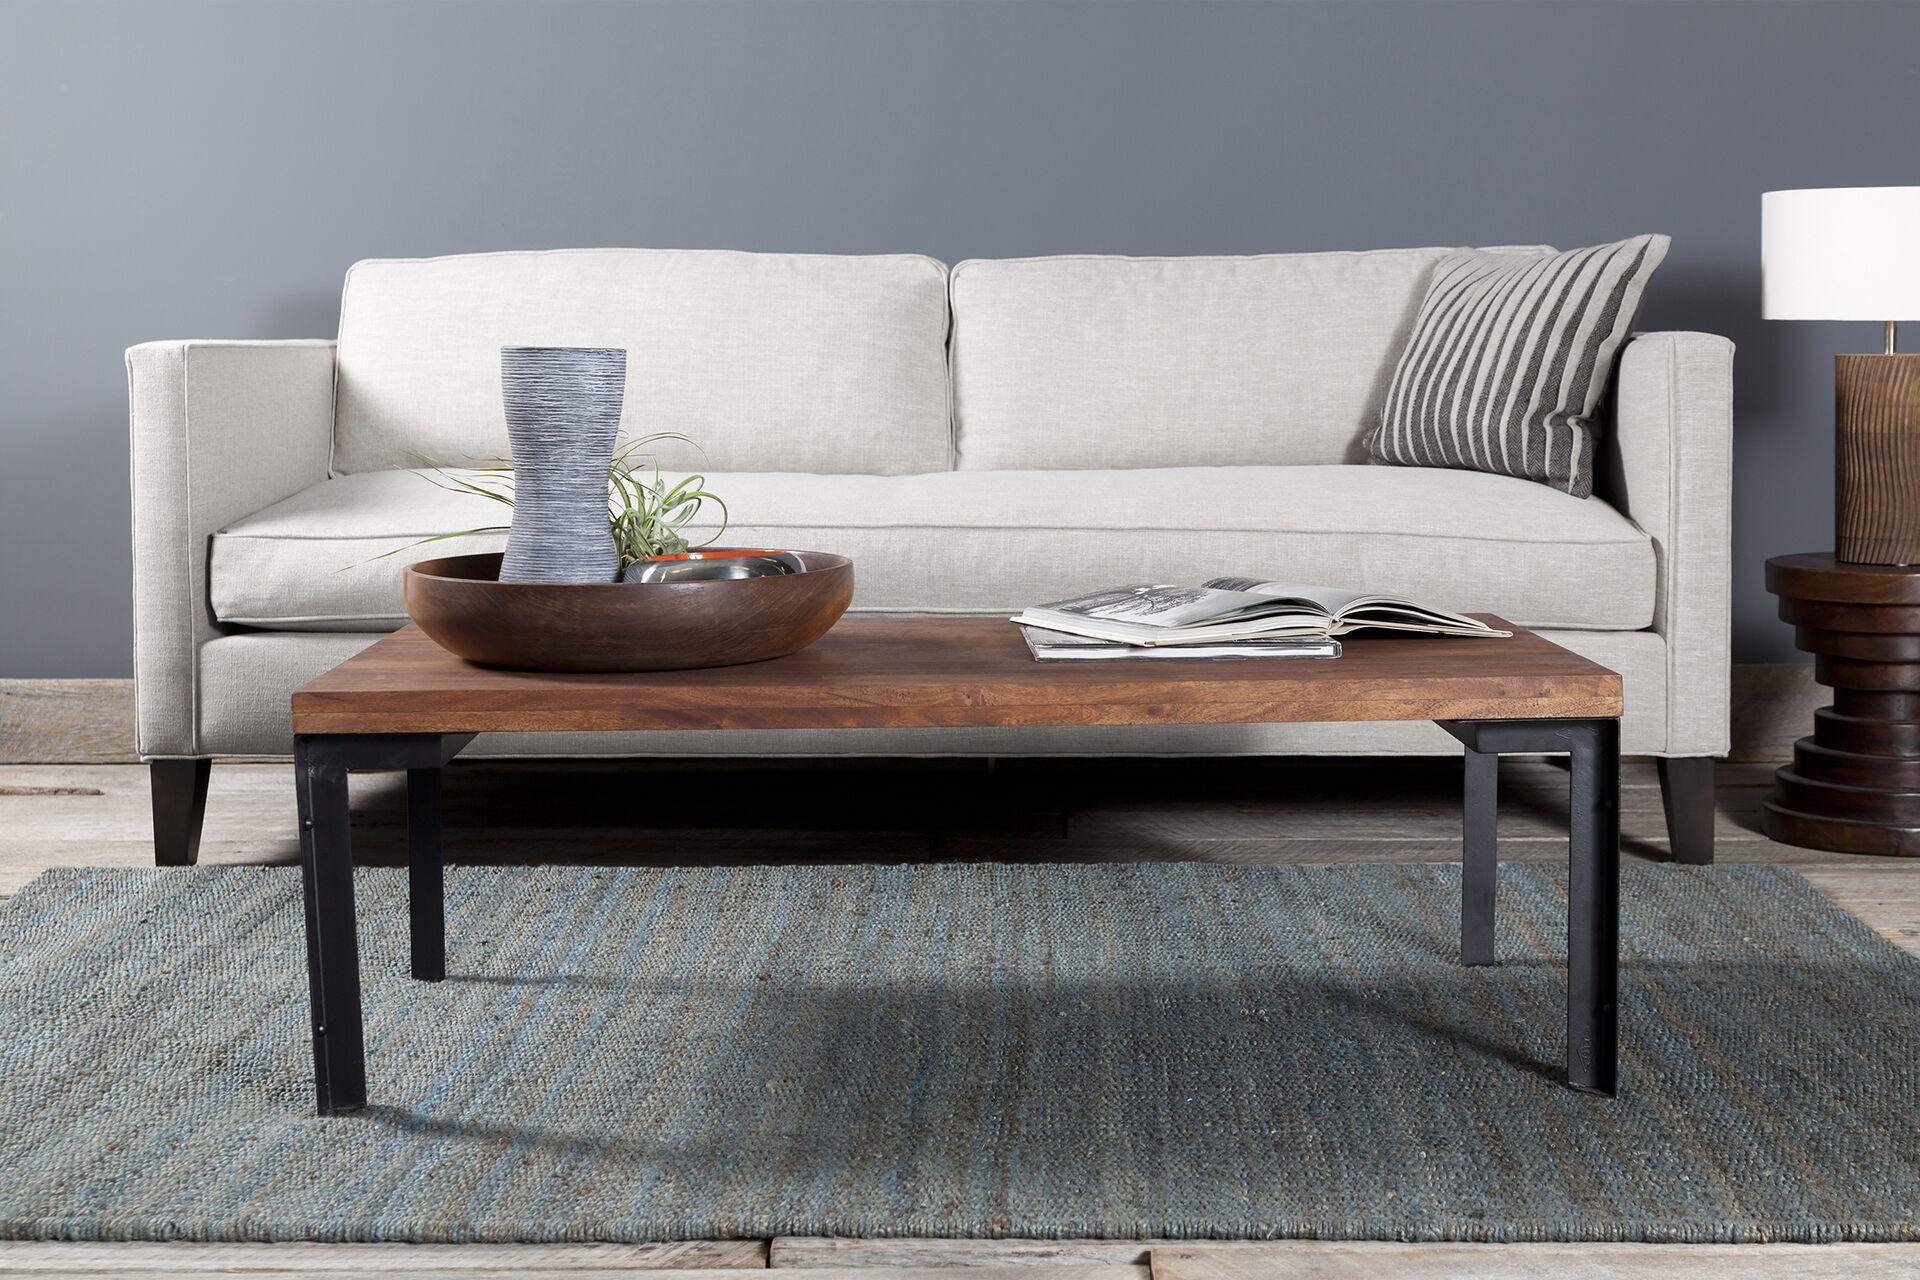 Youmans Textured Contemporary Dark Gray Area Rug Rug Size: 7'9